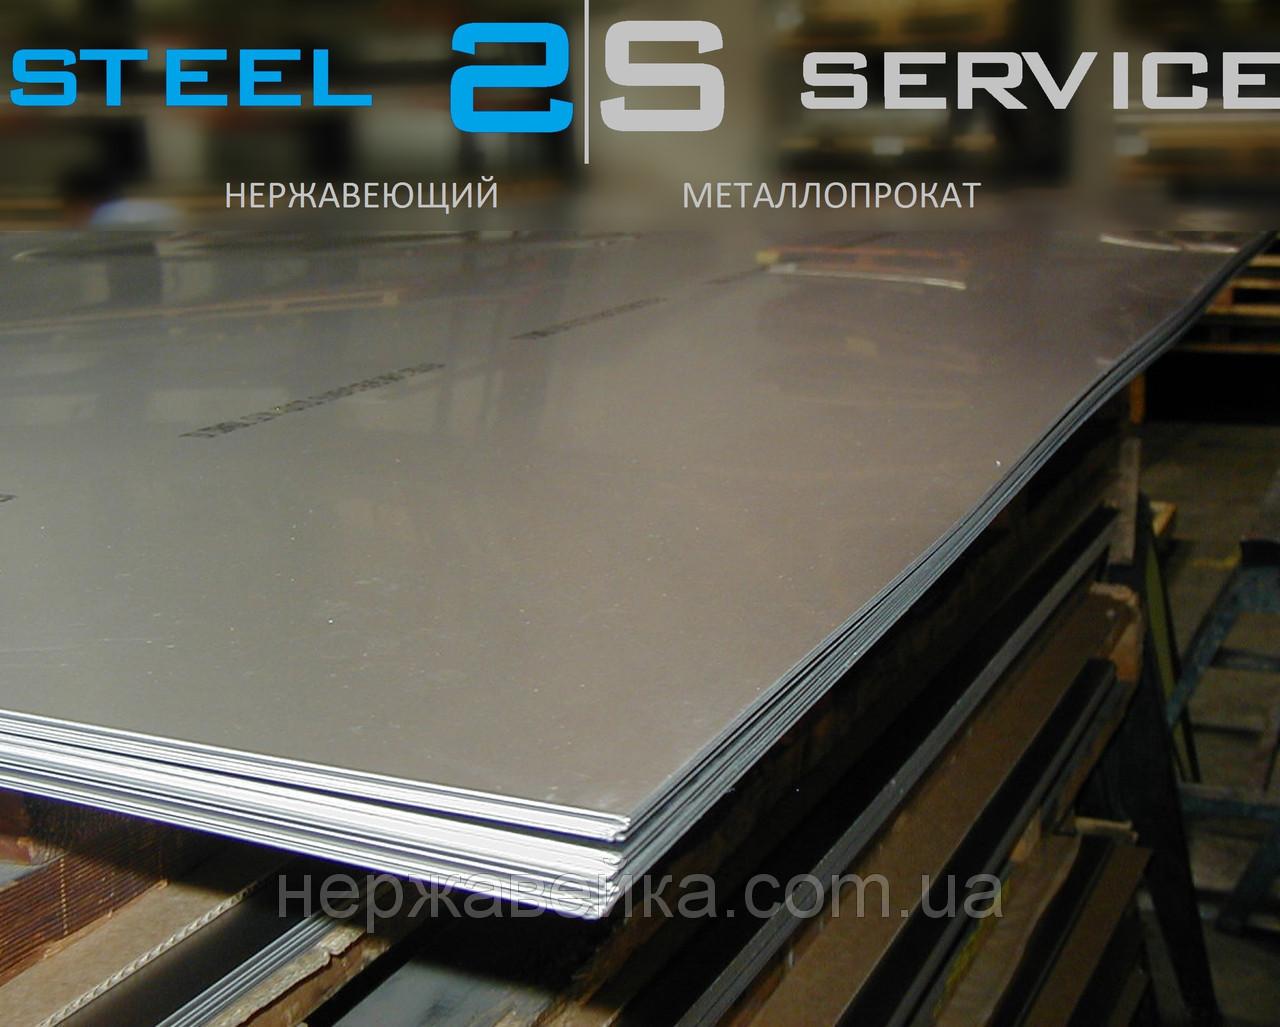 Листовая нержавейка 1,5х1250х2500мм AISI 430(12Х17) BA - зеркало, технический